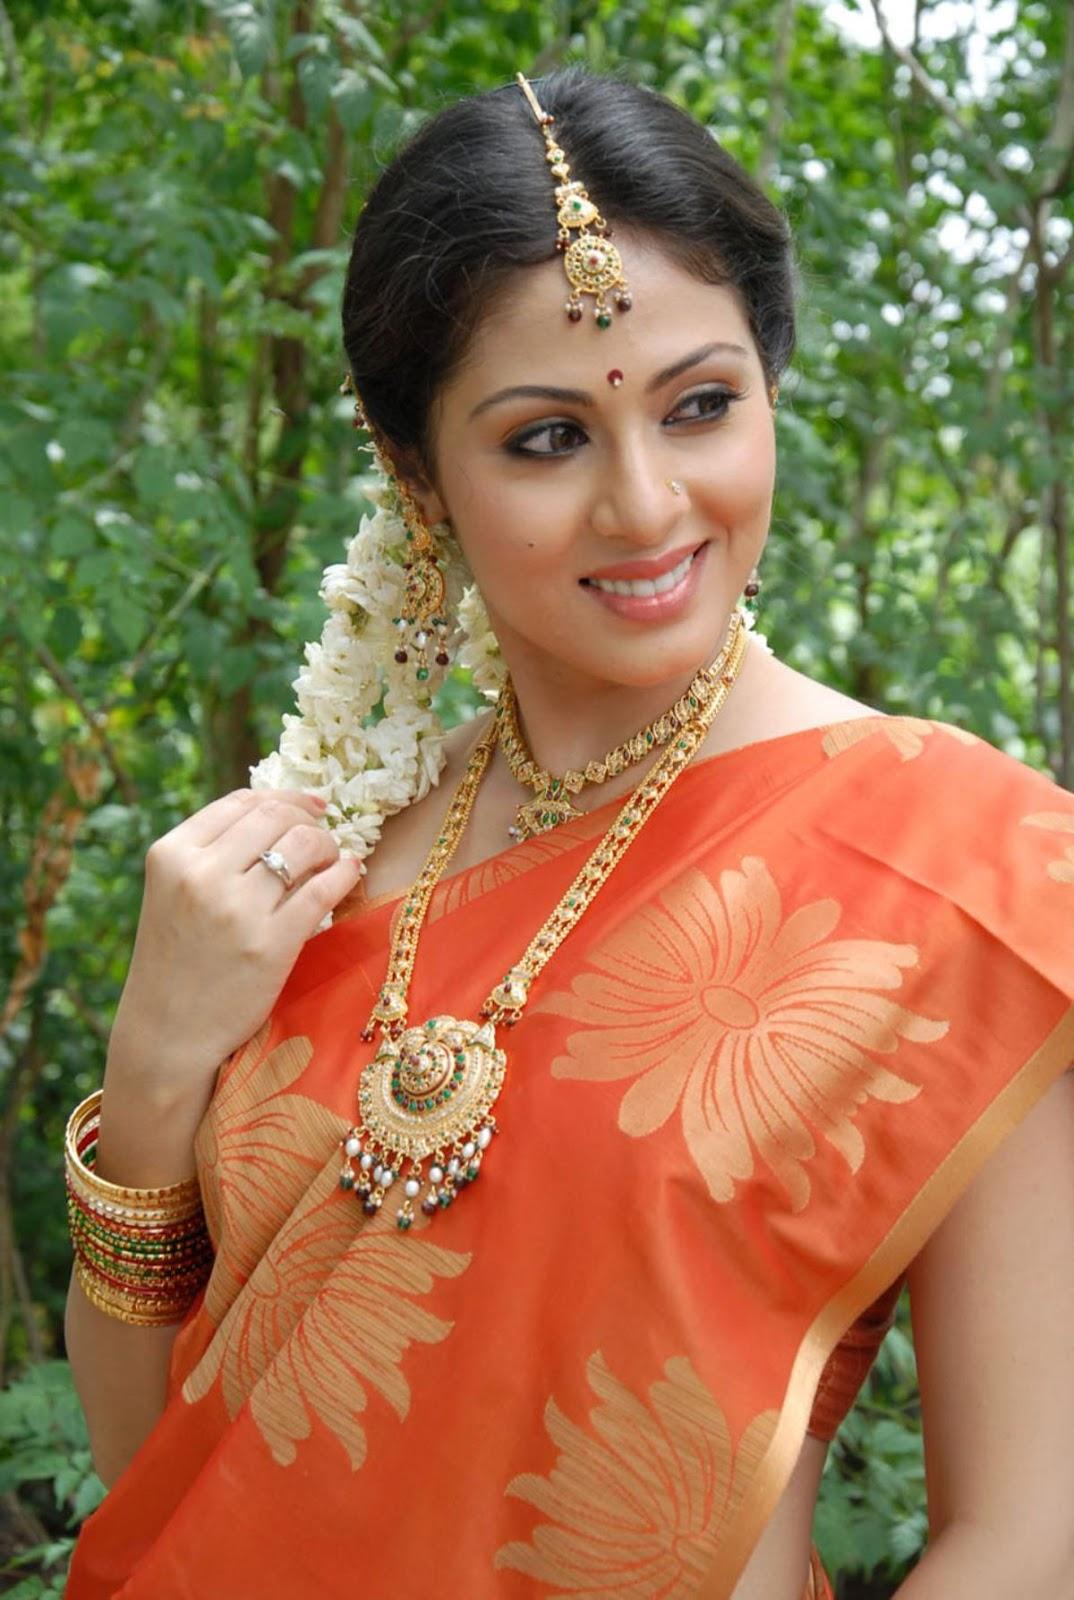 Spicy Saree: .: Sada Latest Hot New Spicy In Saree Images